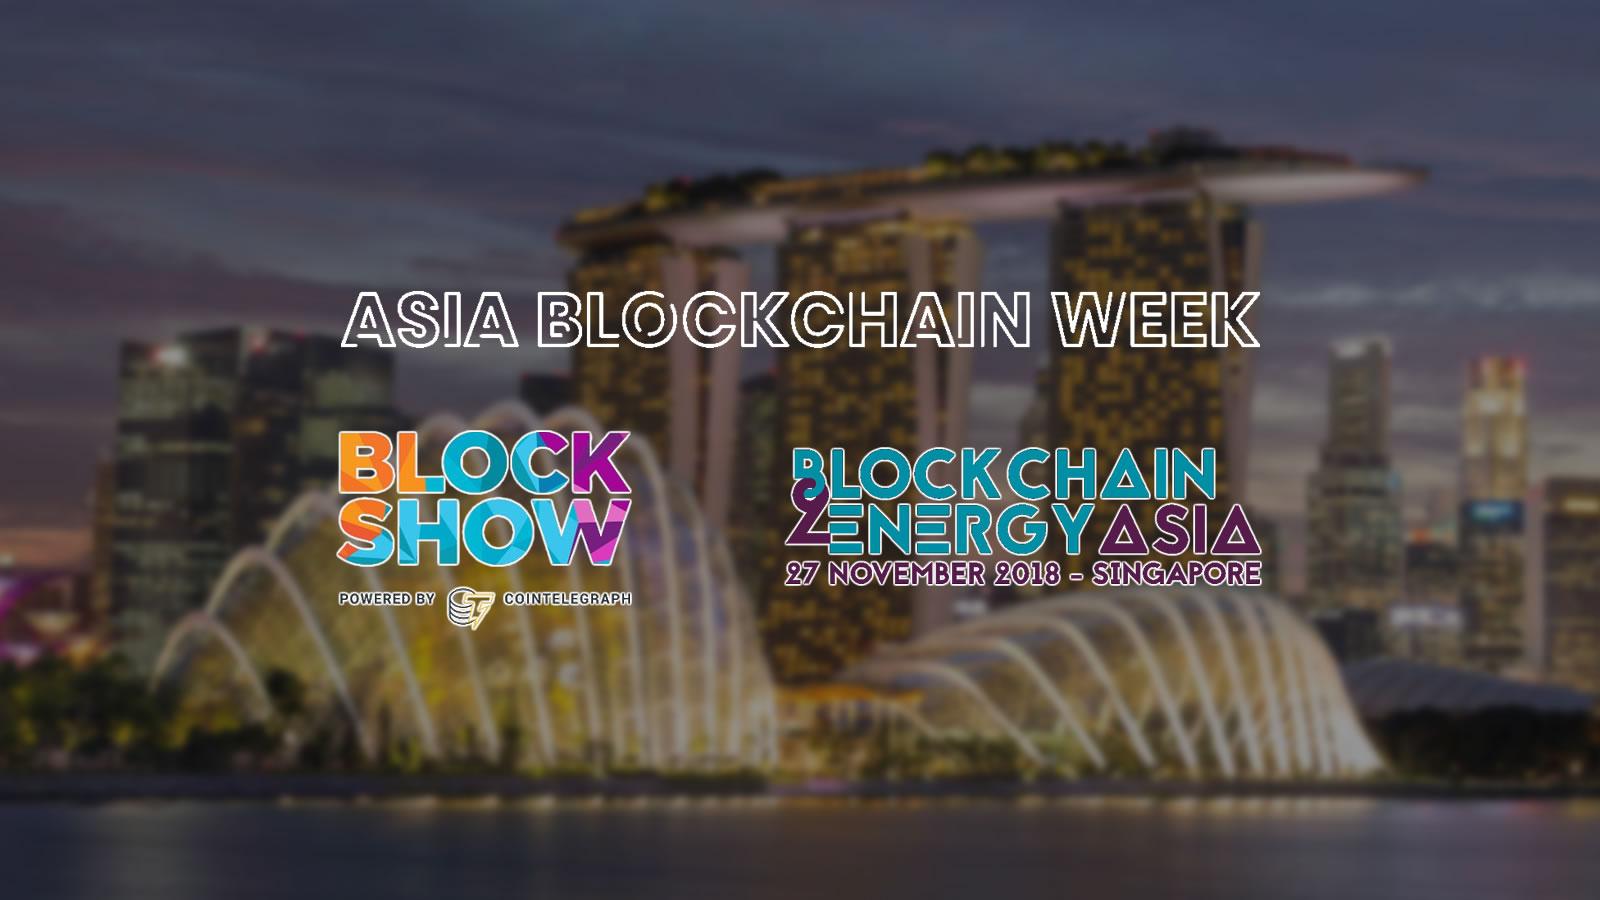 Asia Blockchain Week 02.jpg